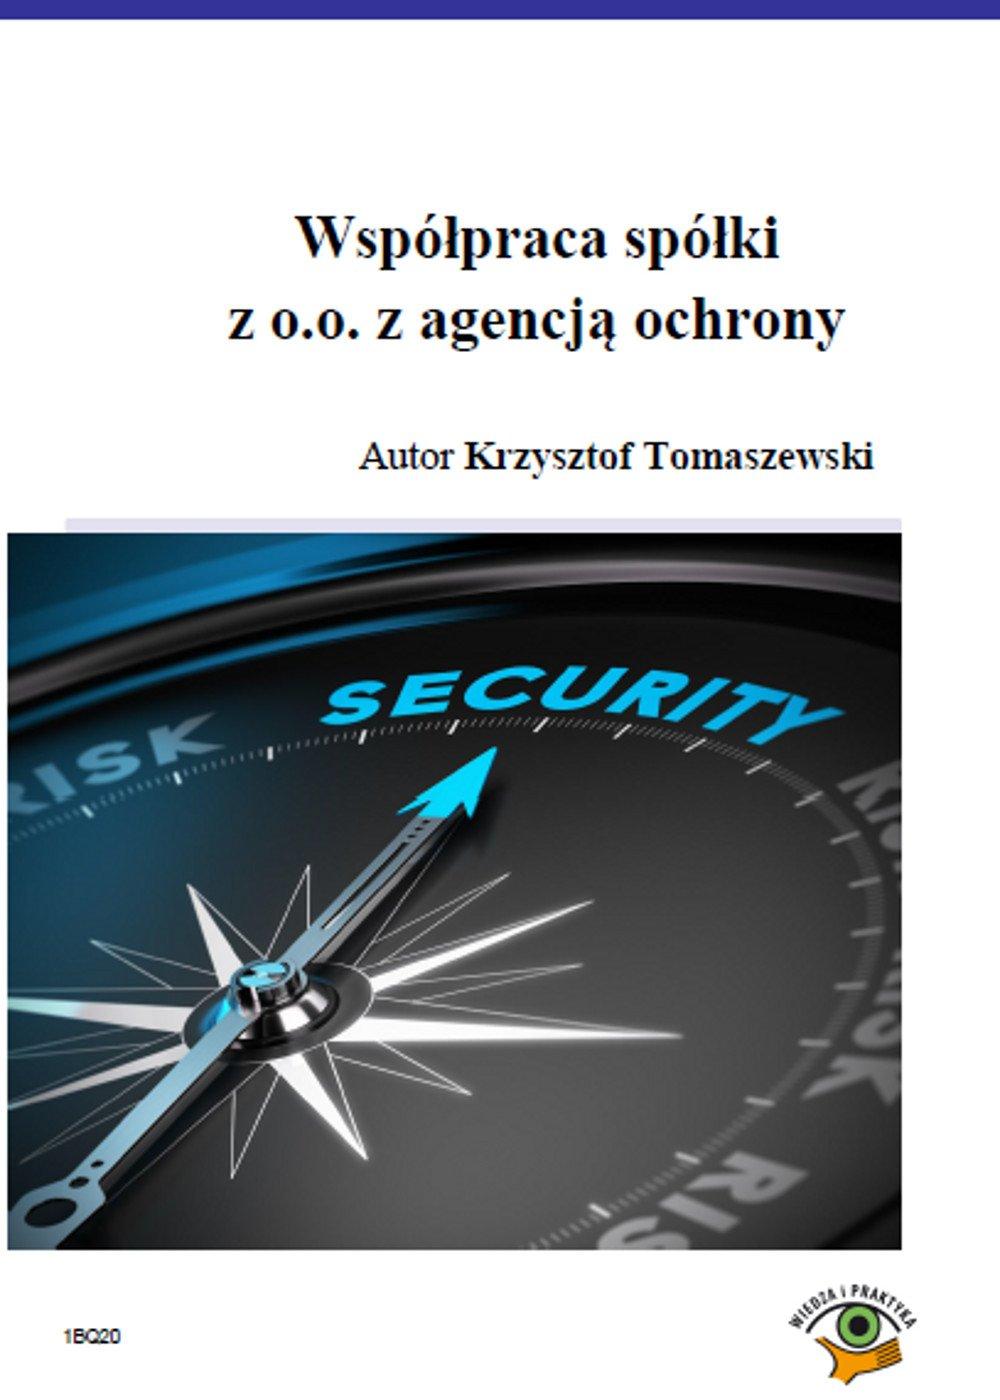 Współpraca spółki z o.o. z agencją ochrony - Ebook (Książka na Kindle) do pobrania w formacie MOBI